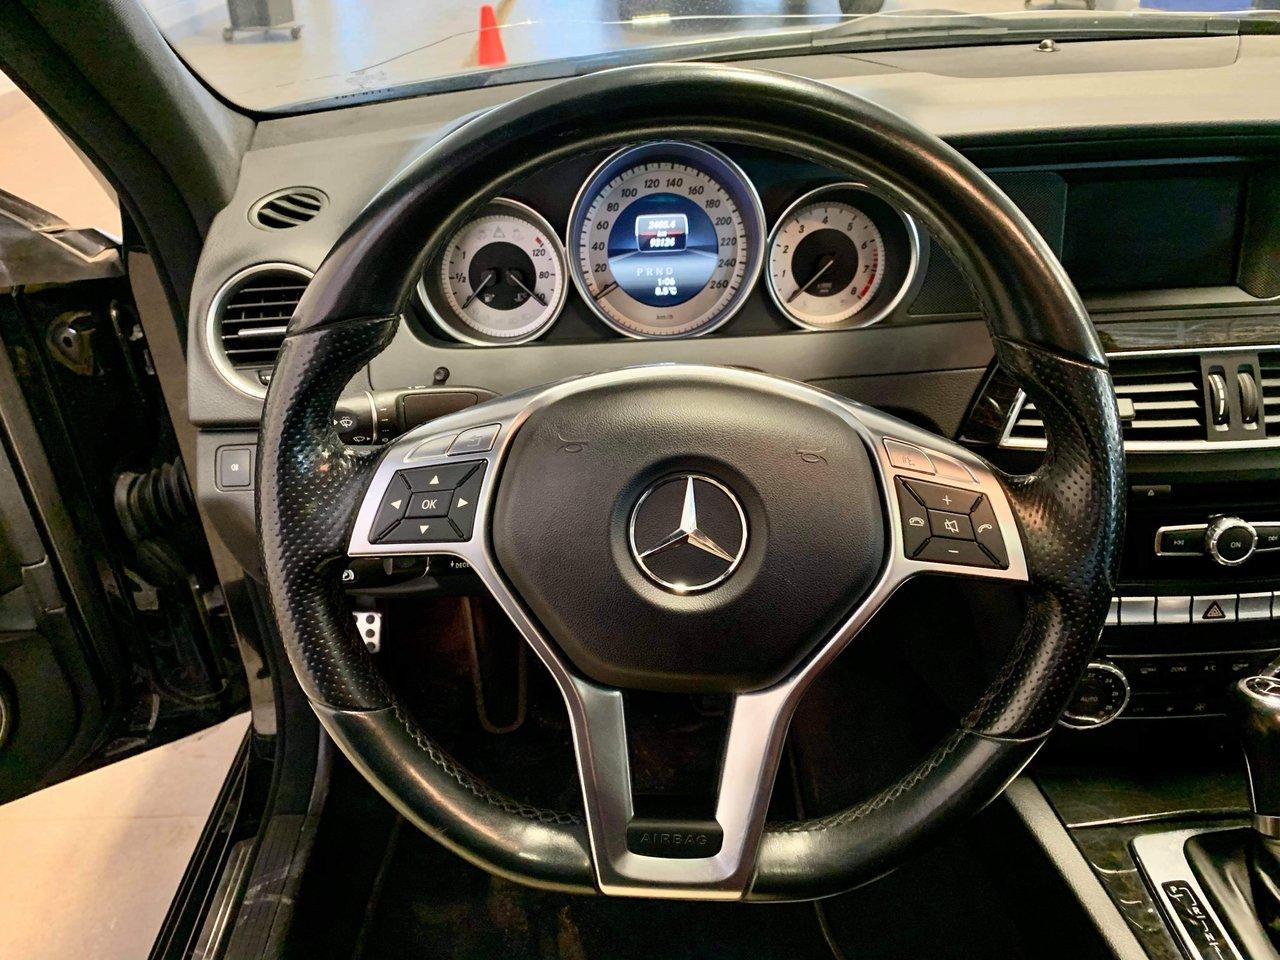 2014 Mercedes-Benz C-Class 4dr Sdn C300 4MATIC